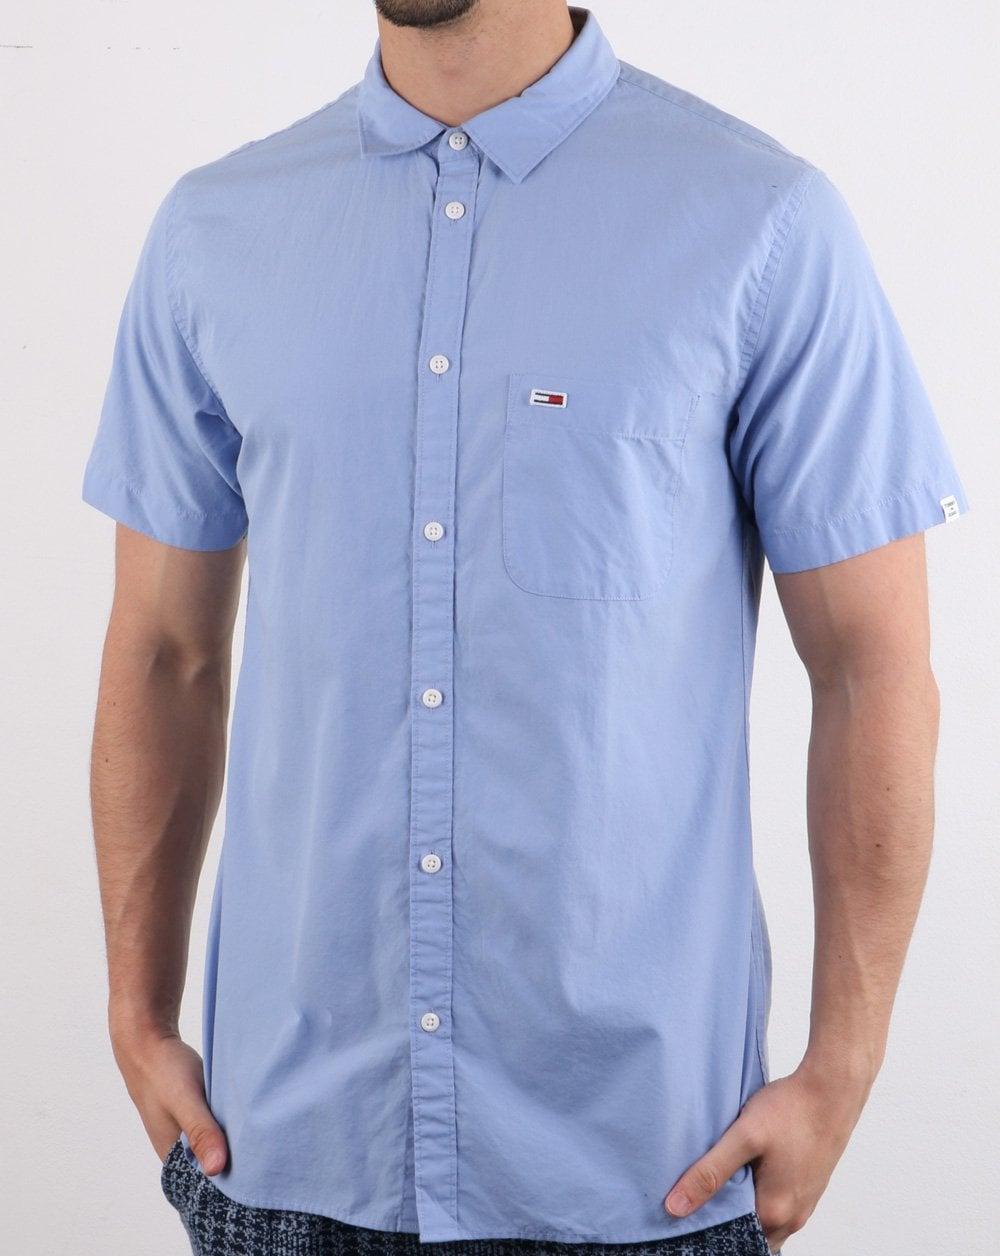 c6c48f16e Tommy Hilfiger Jeans Tommy Hilfiger Short Sleeve Poplin Shirt Sky Blue